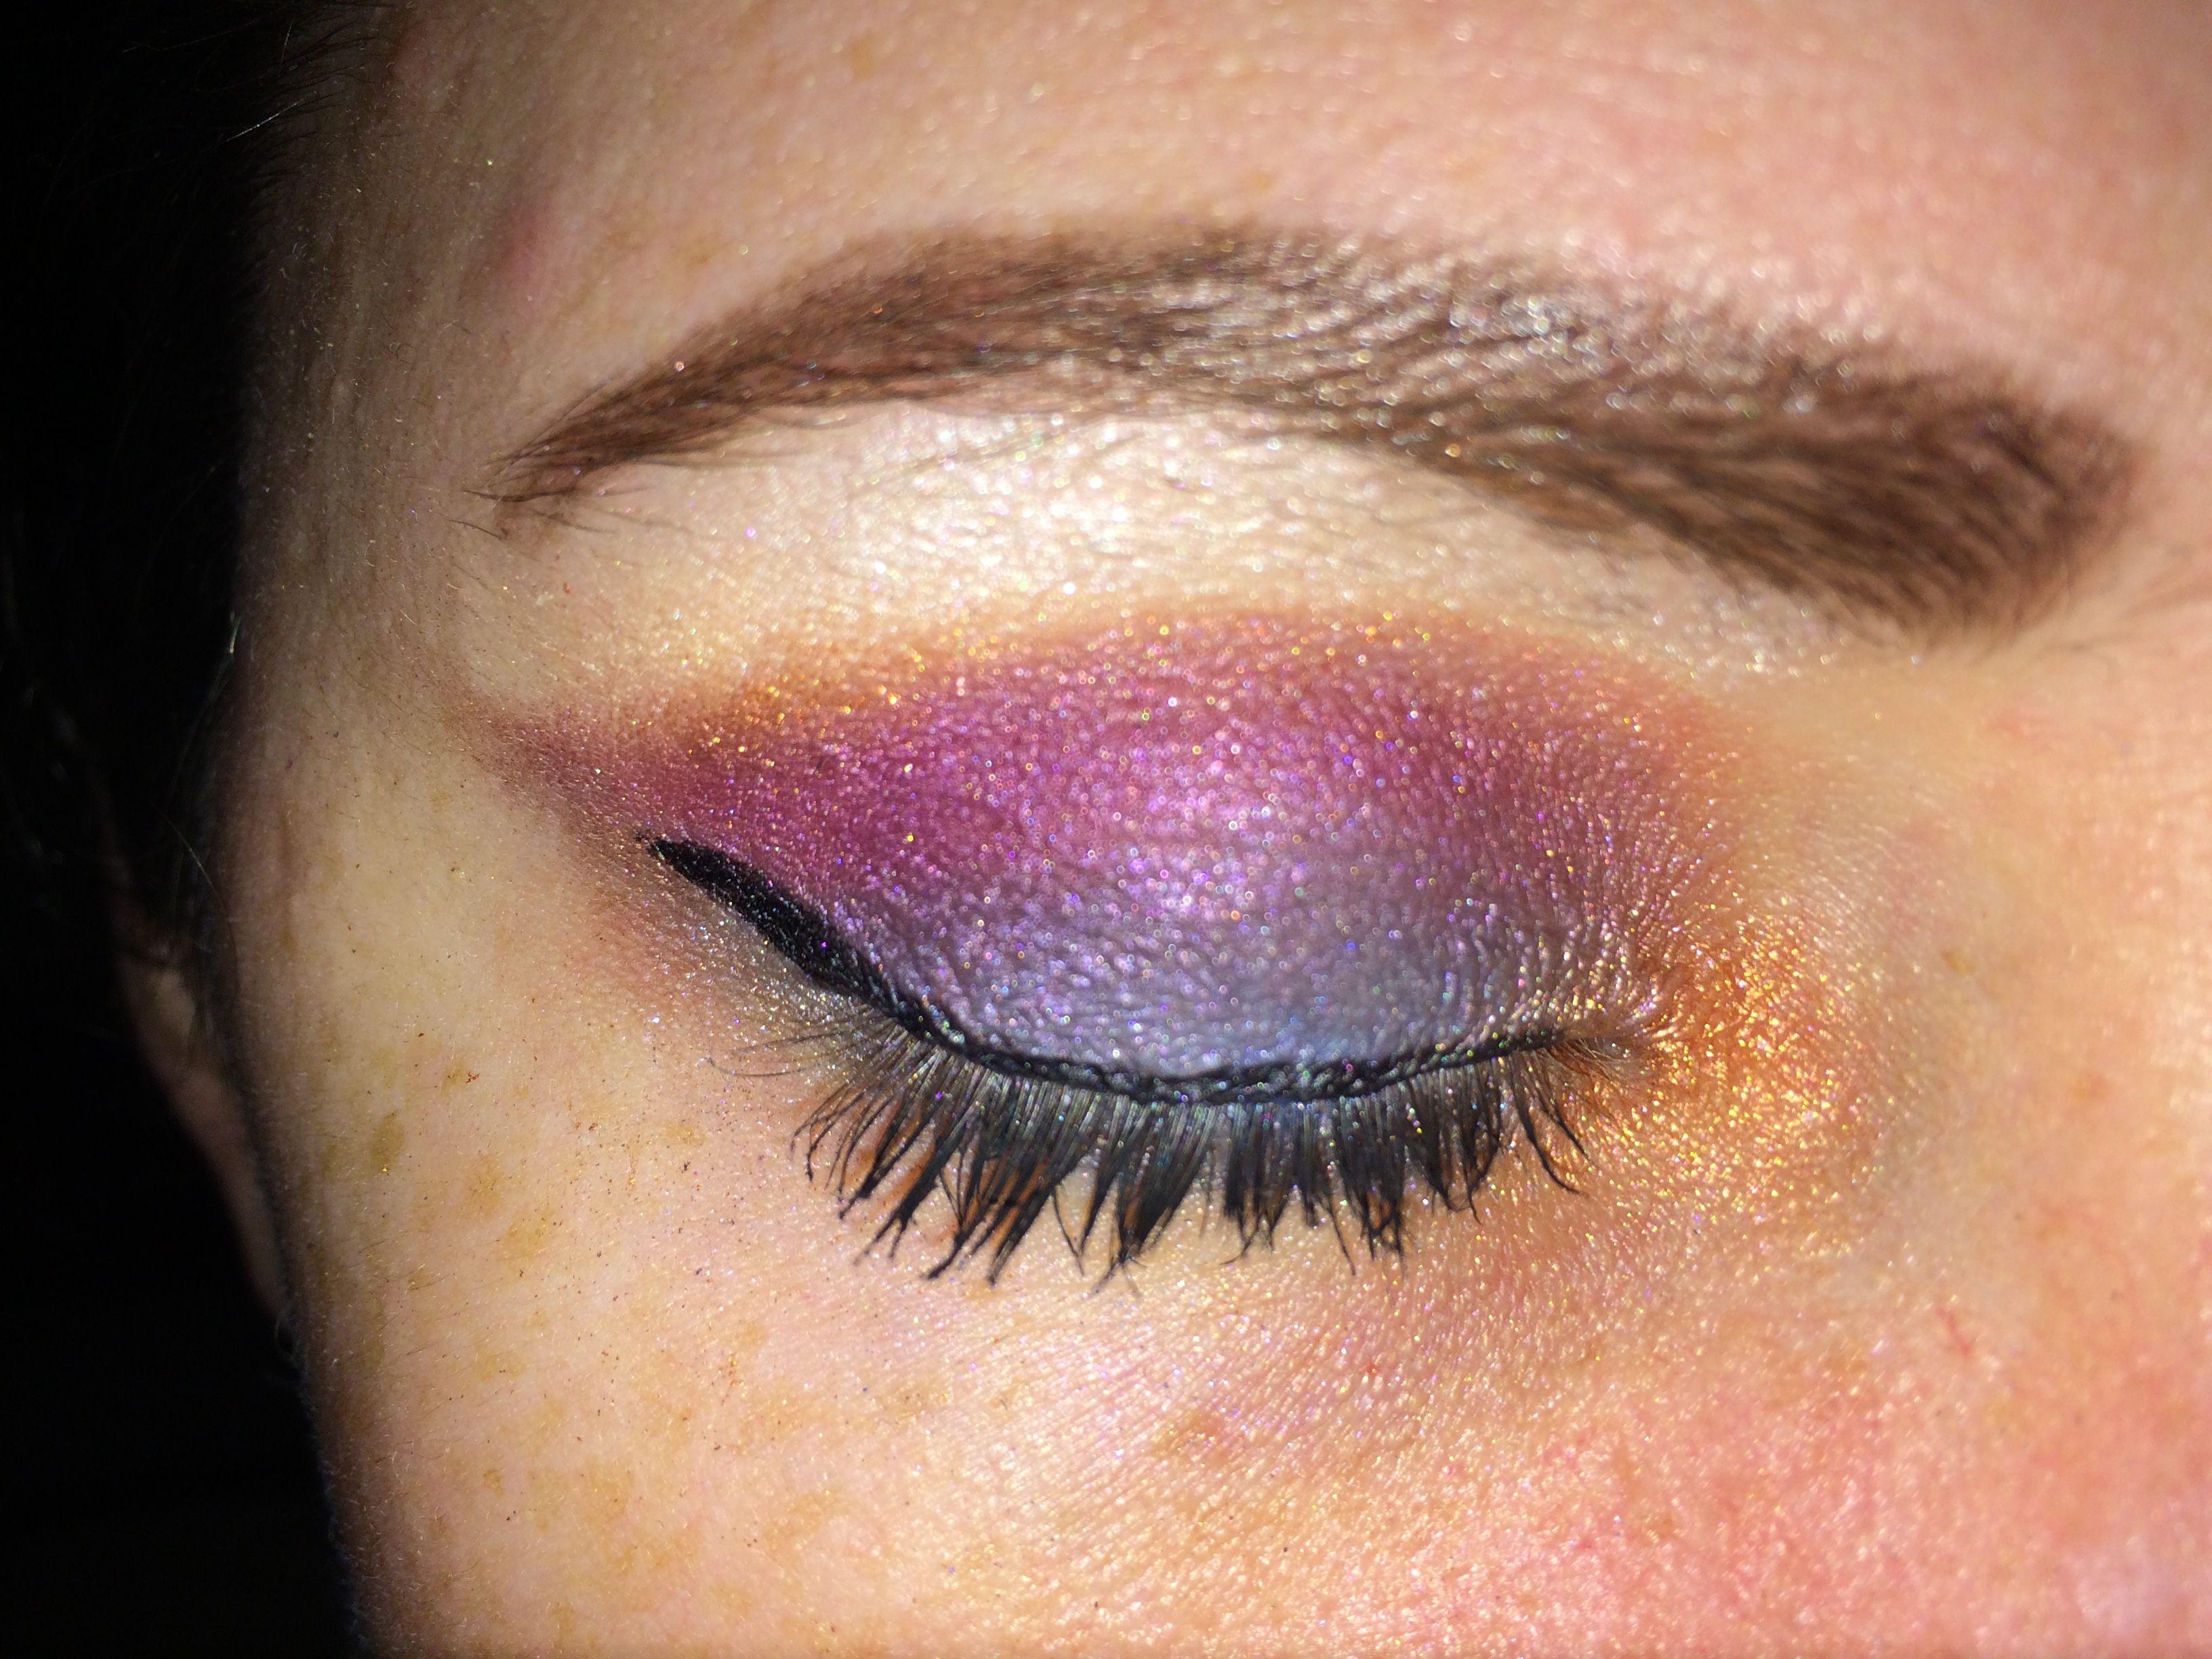 Eye makeup based on 'sunset'. #sunset #eyeshadow